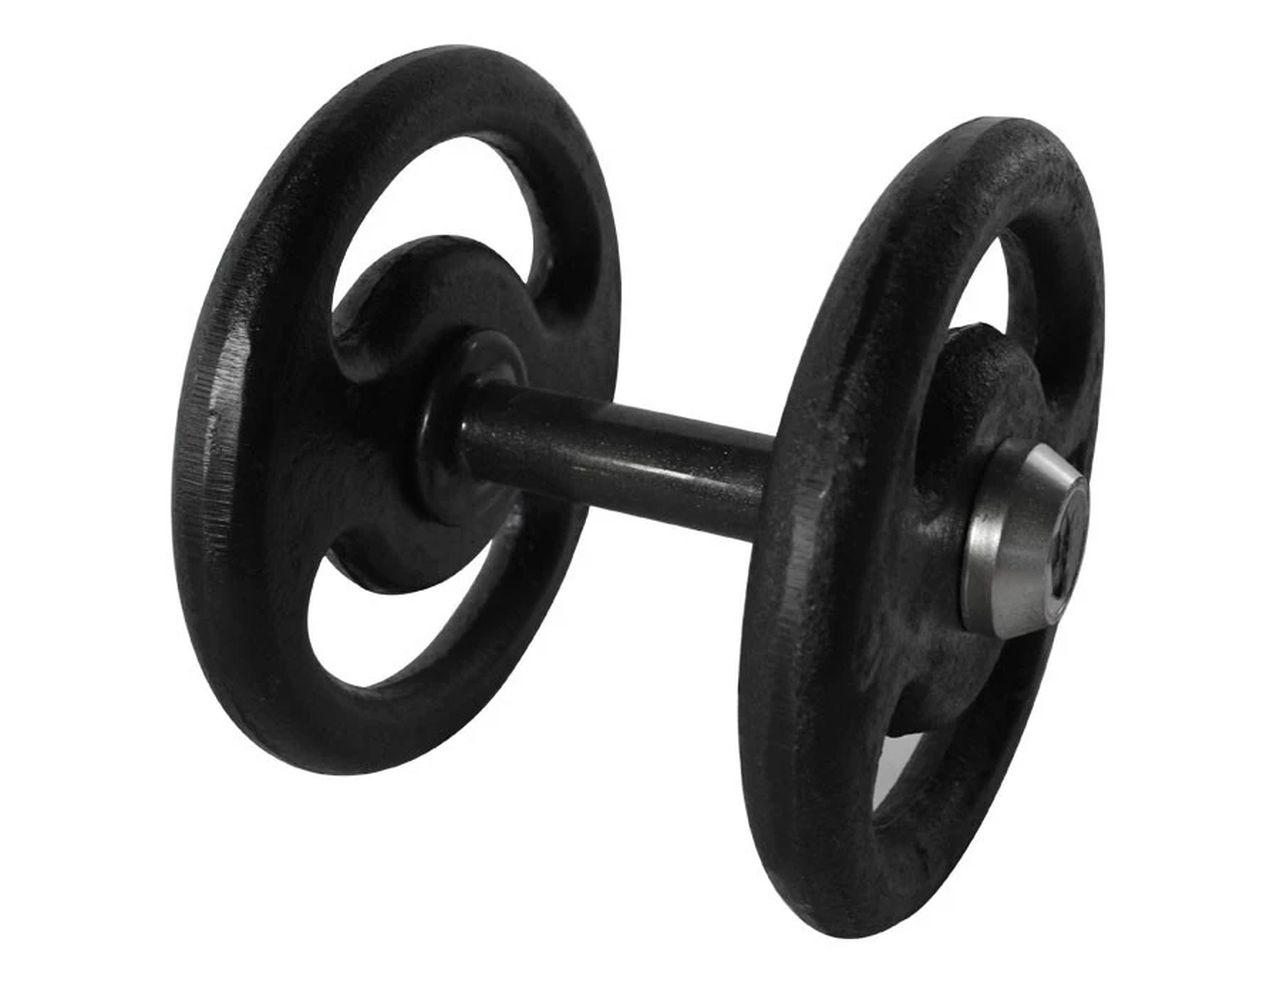 Dumbbell Pintado Pegada Emborrachada Academia Fitness 10kg  - Panela de Ferro Fundido